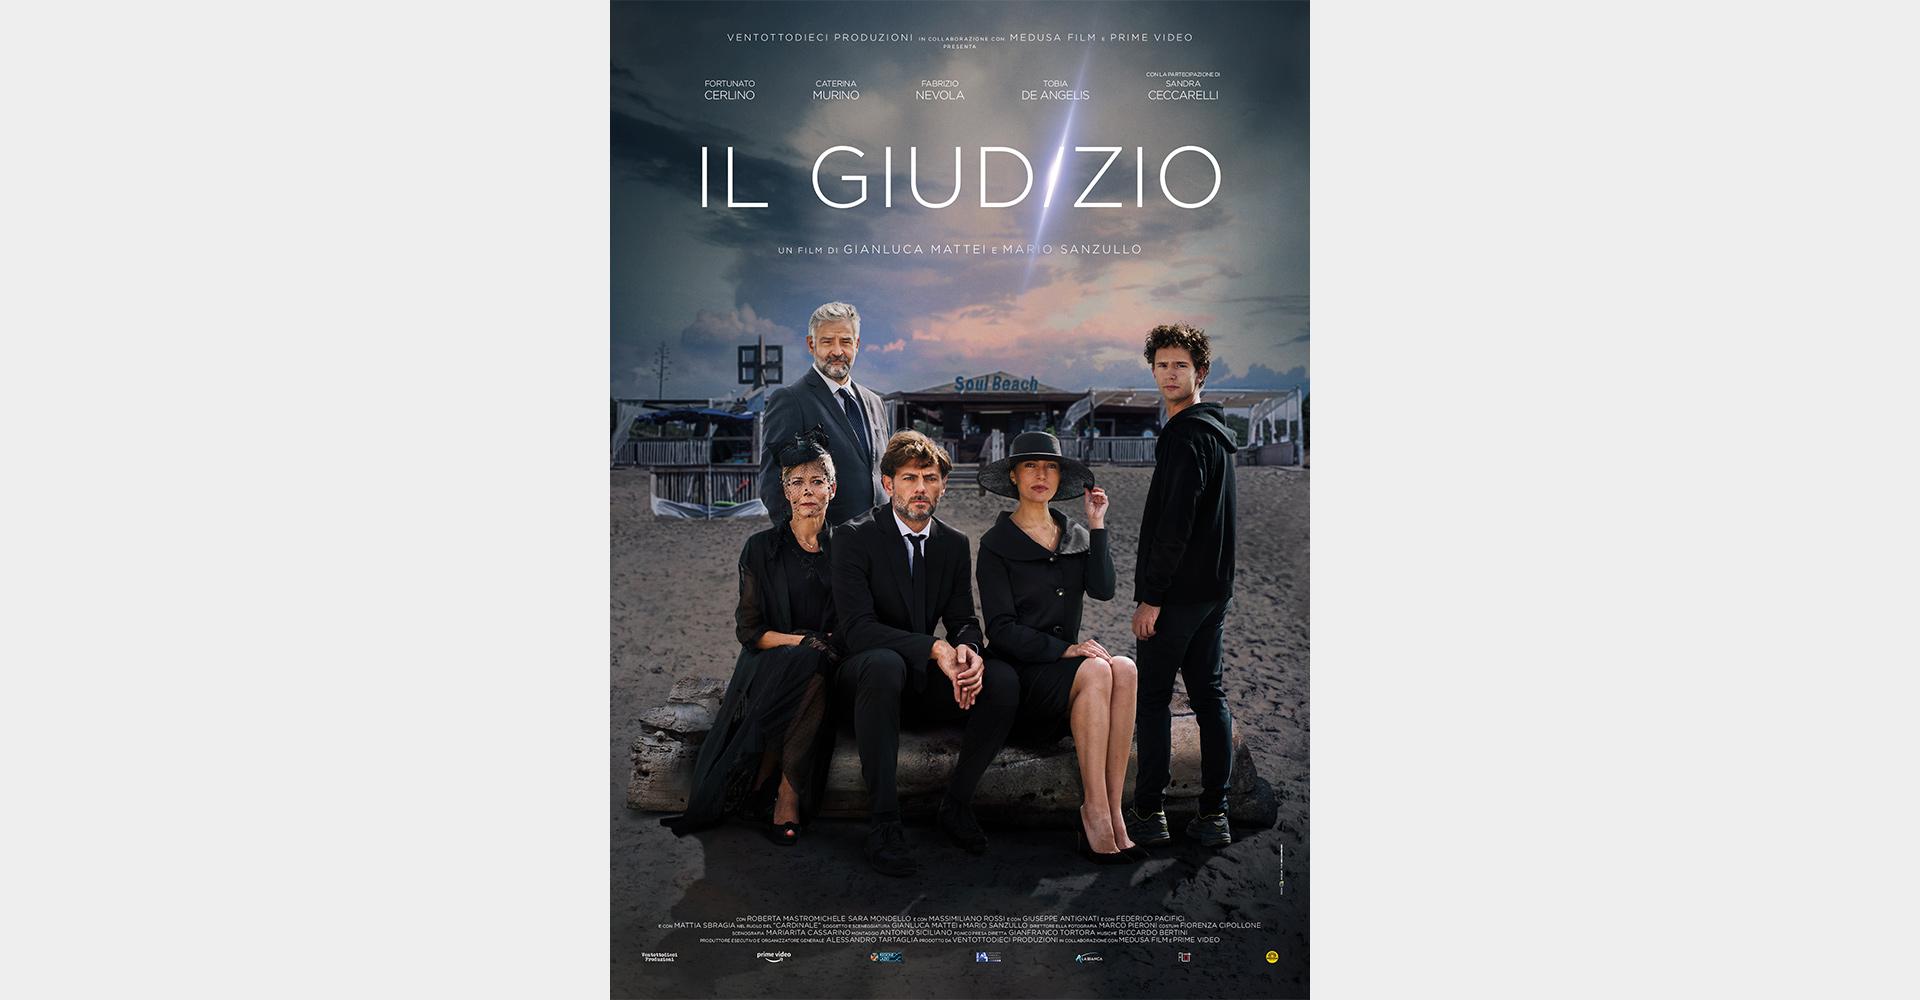 IlGiudizio_Behance_04